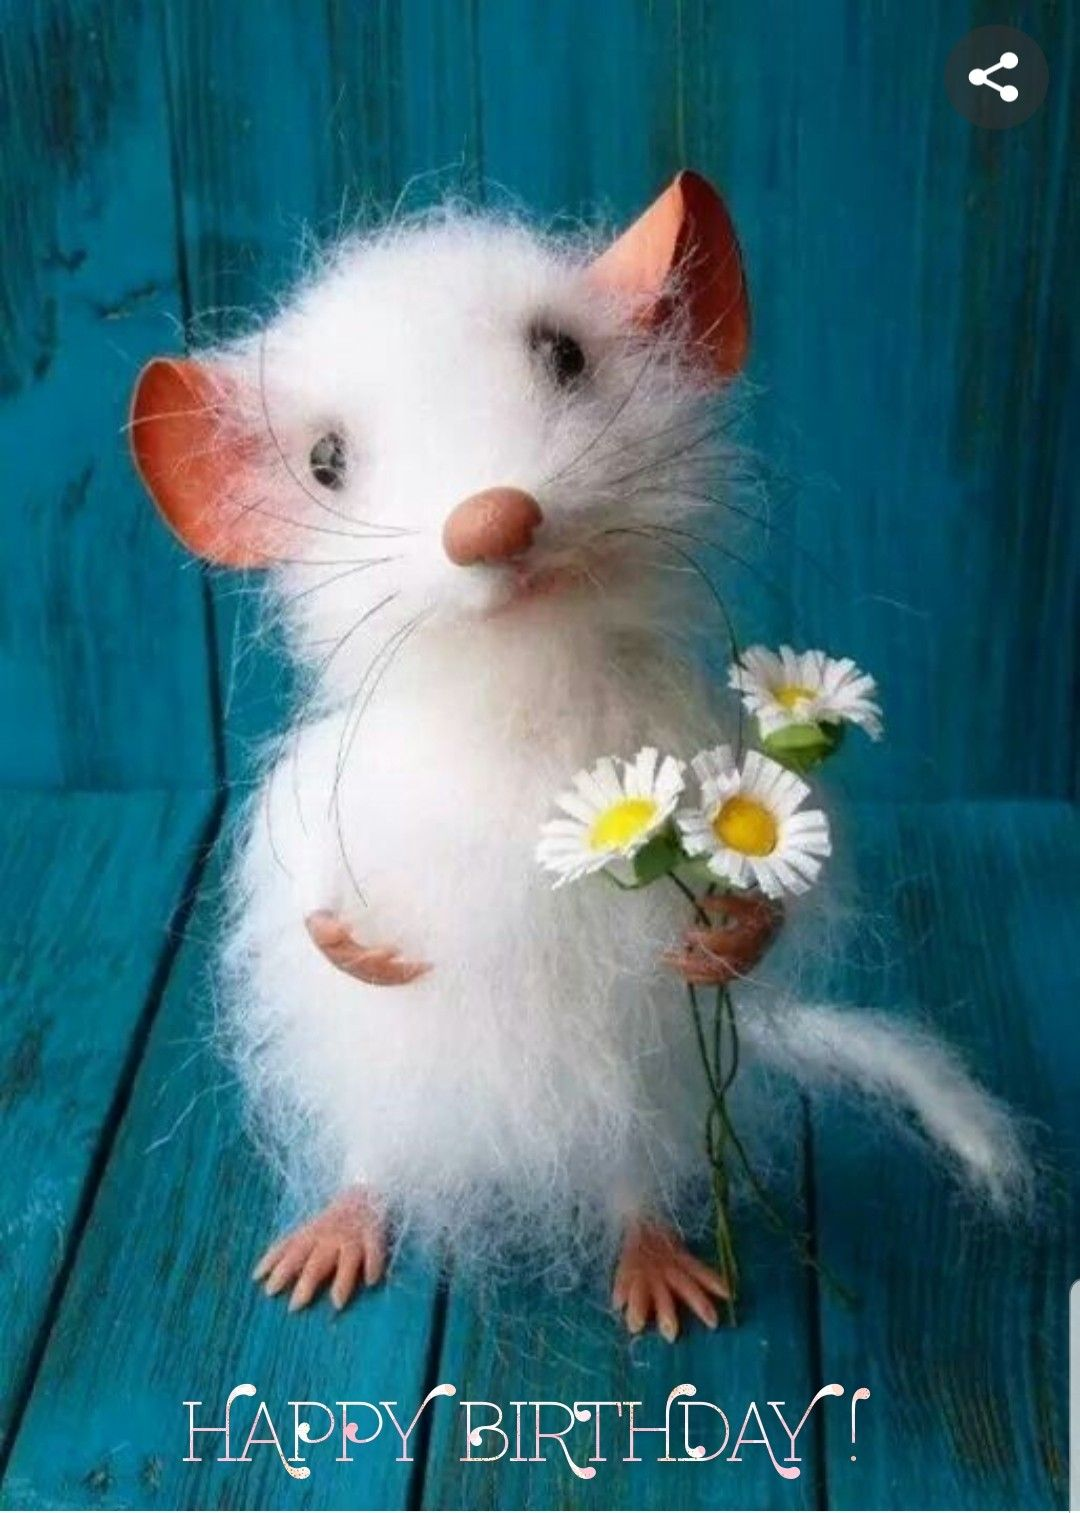 Postkarte Geburtstag Blumen Aquarell Nastami De